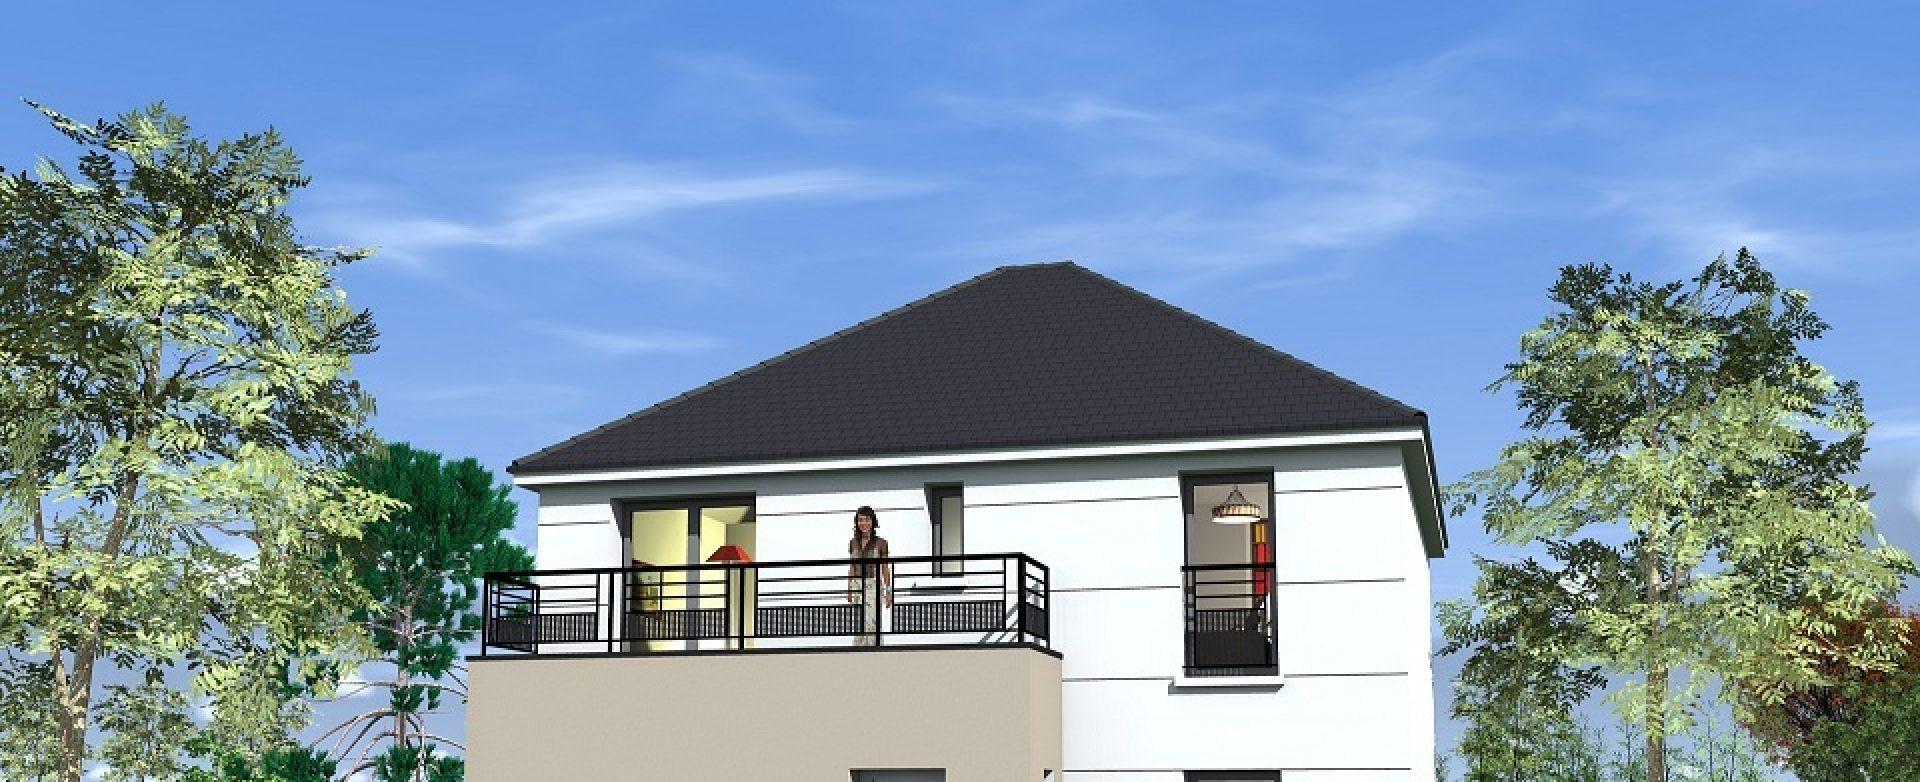 Construction maison neuve antony ventana blog for Construction maison neuve 92